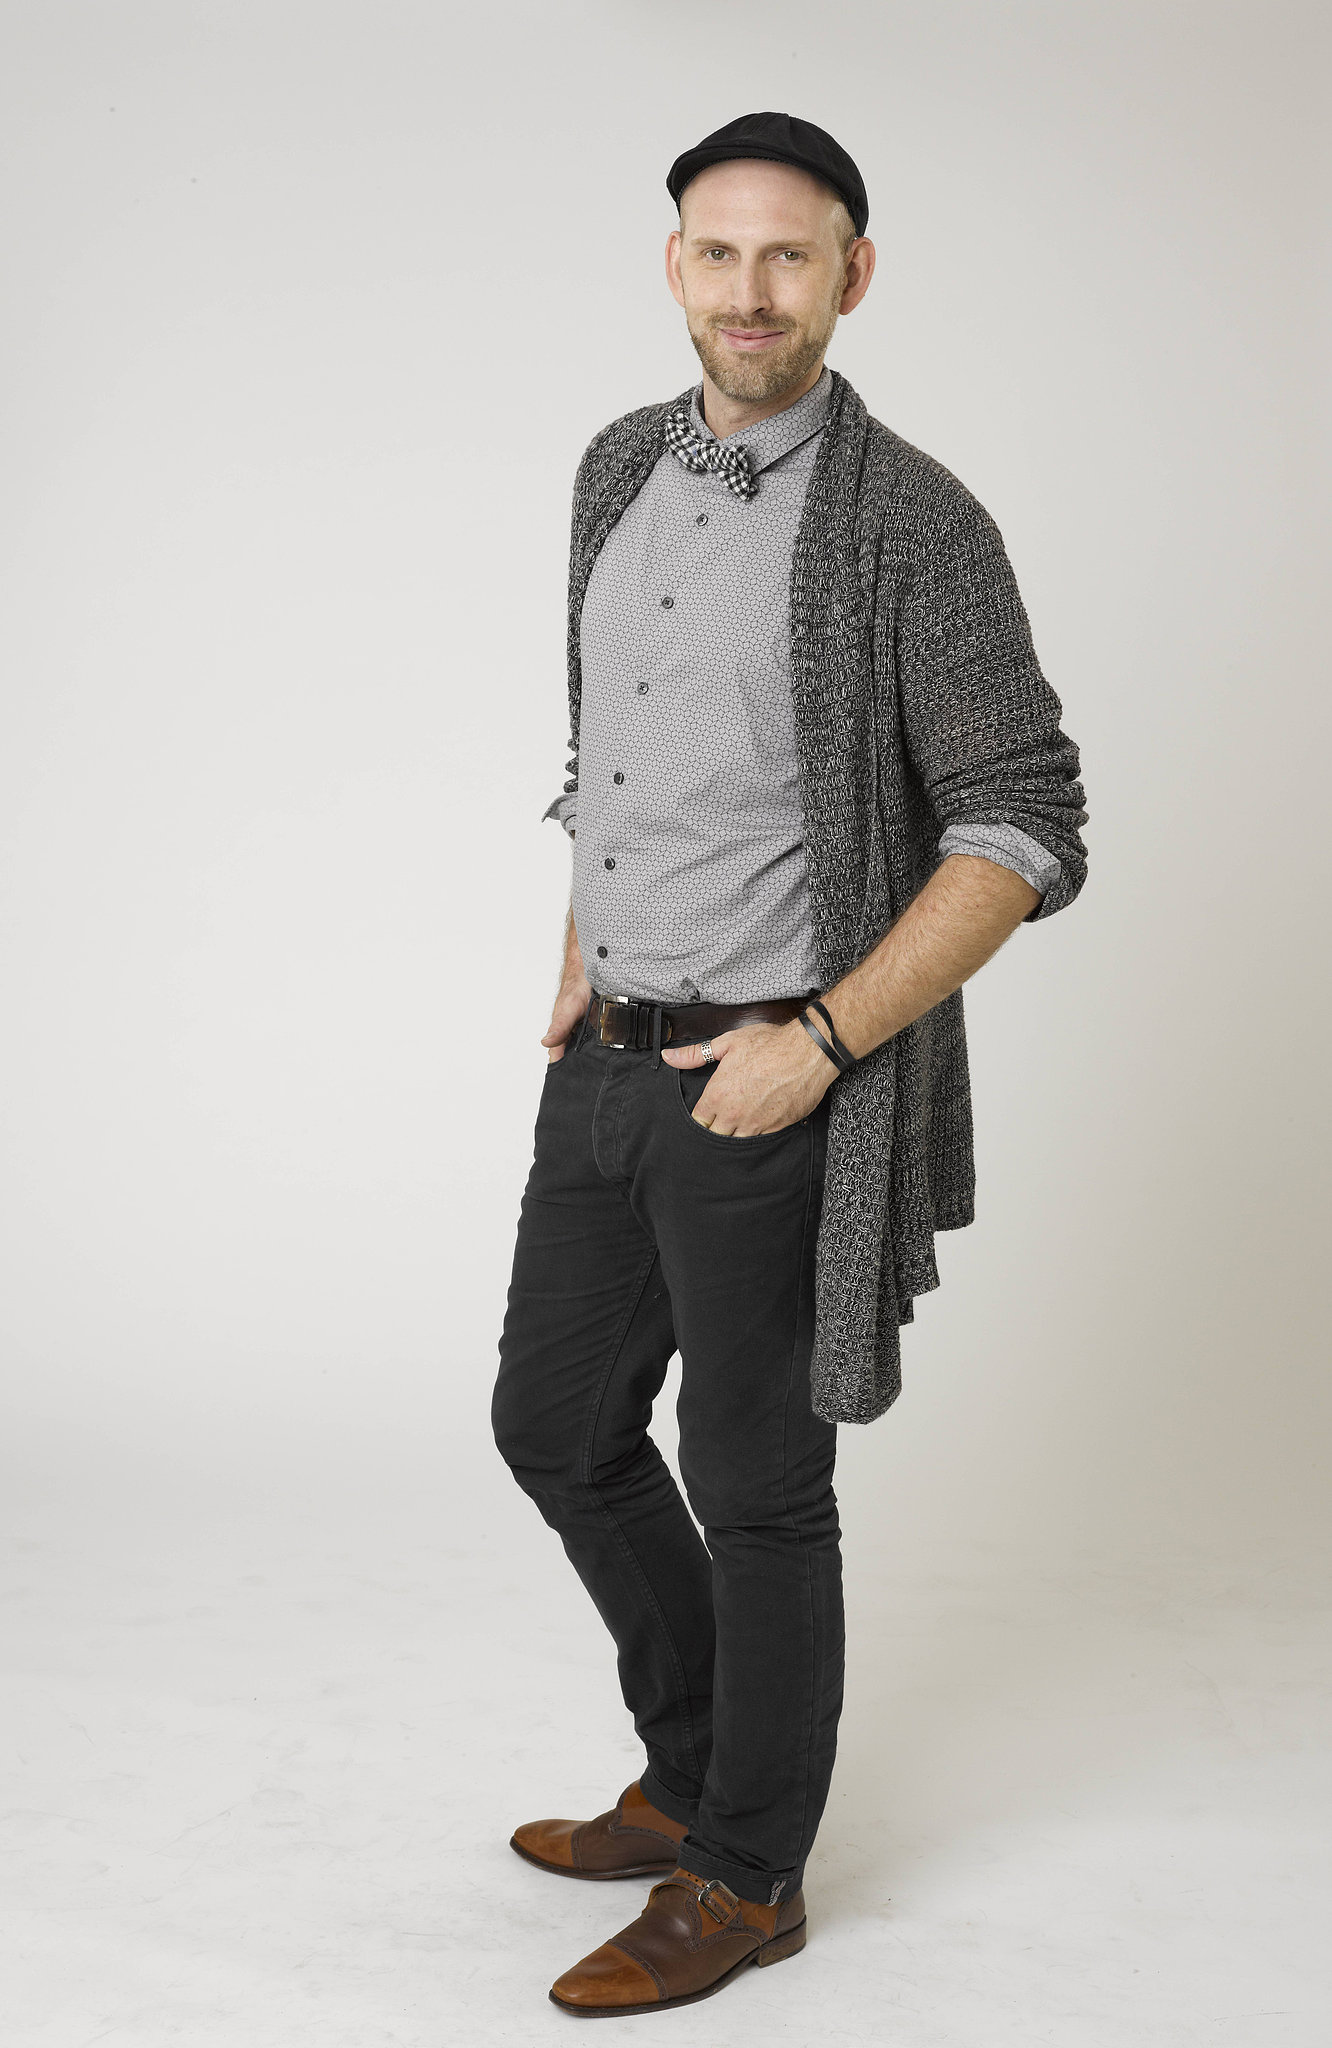 Justin LeBlanc